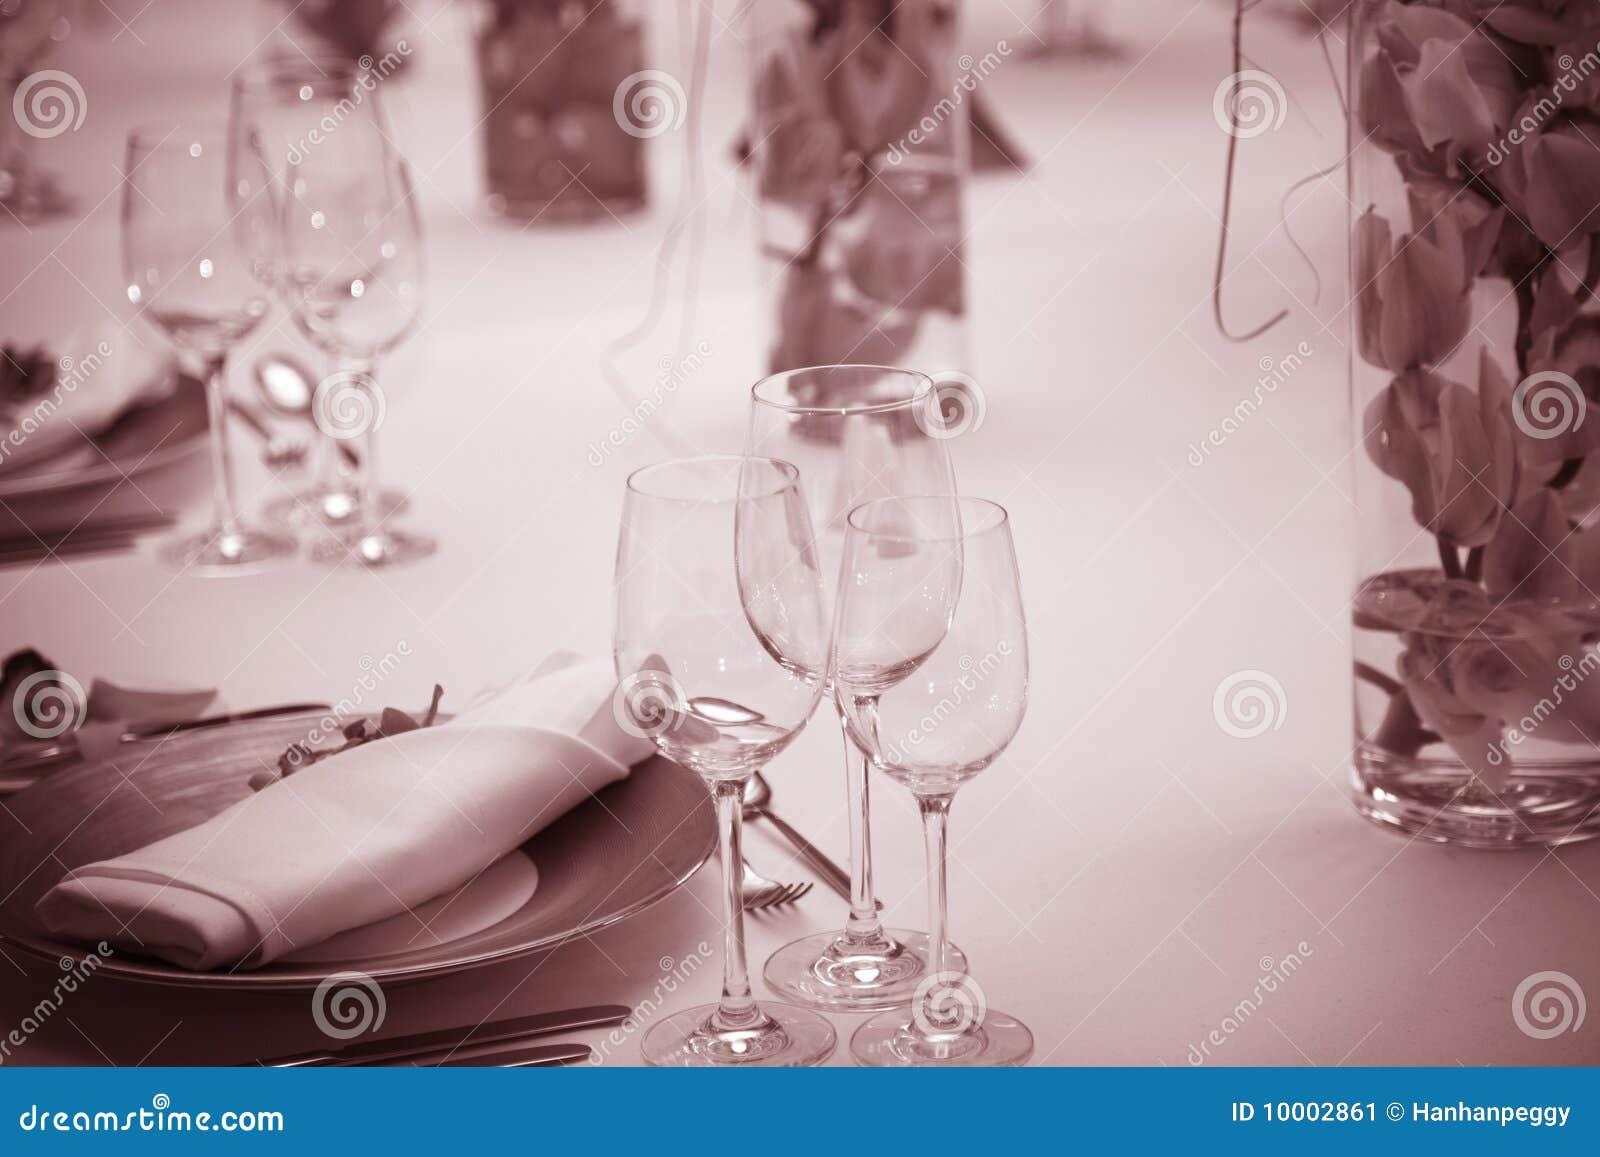 Table Setting Background table setting background stock image - image: 10002861